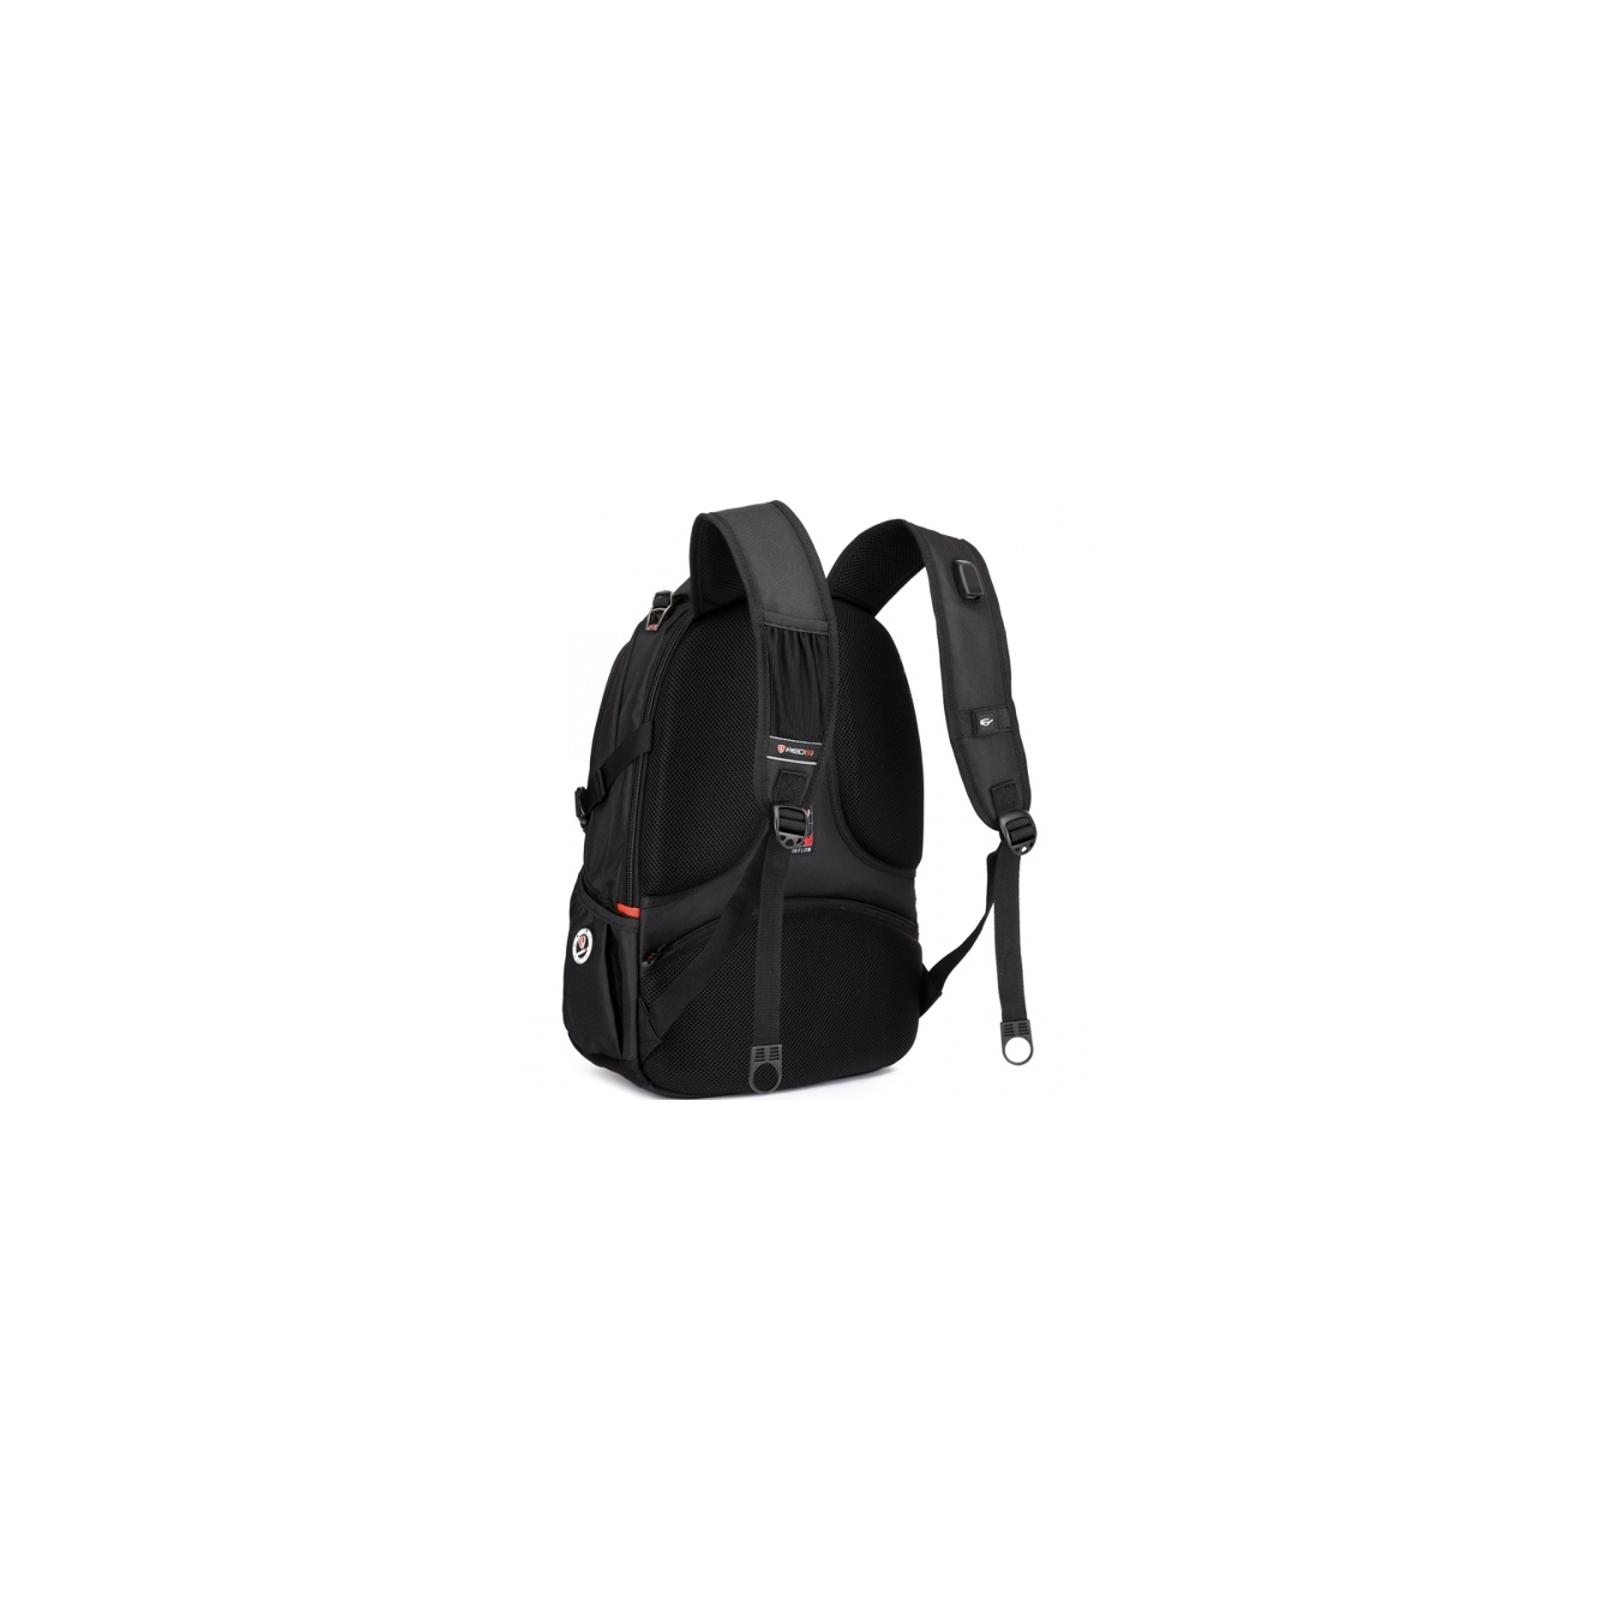 Рюкзак для ноутбука Continent 16'' BP-302 BK (BP-302BK) изображение 3